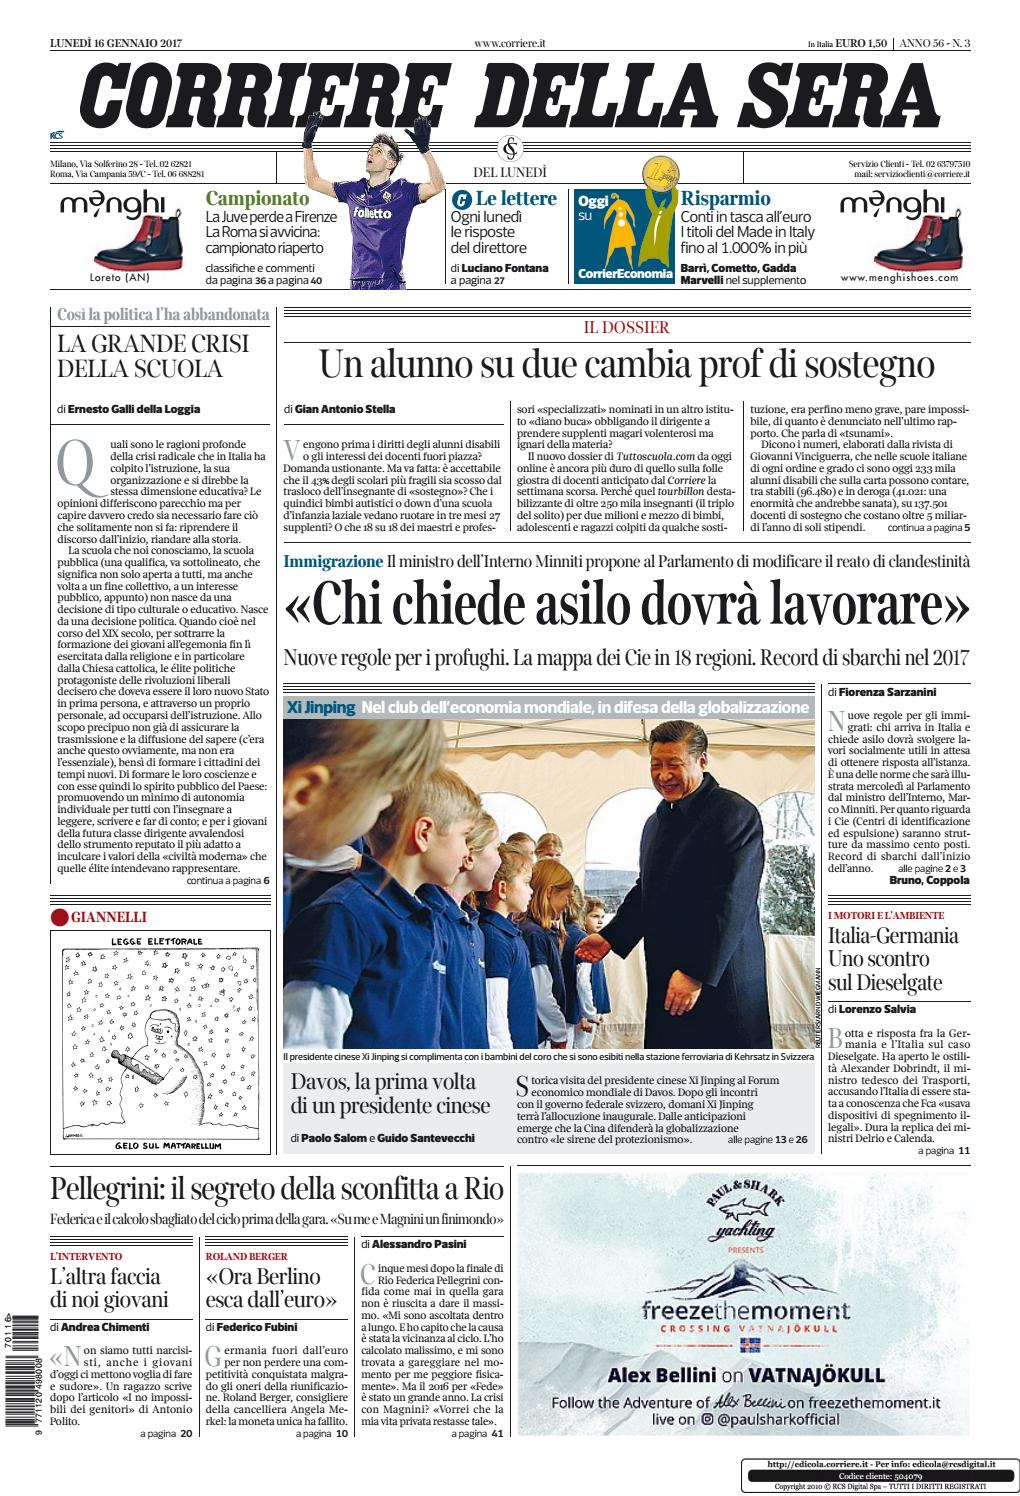 Corriere della sera 20170116 by Kantar Media - issuu 501db78dba5